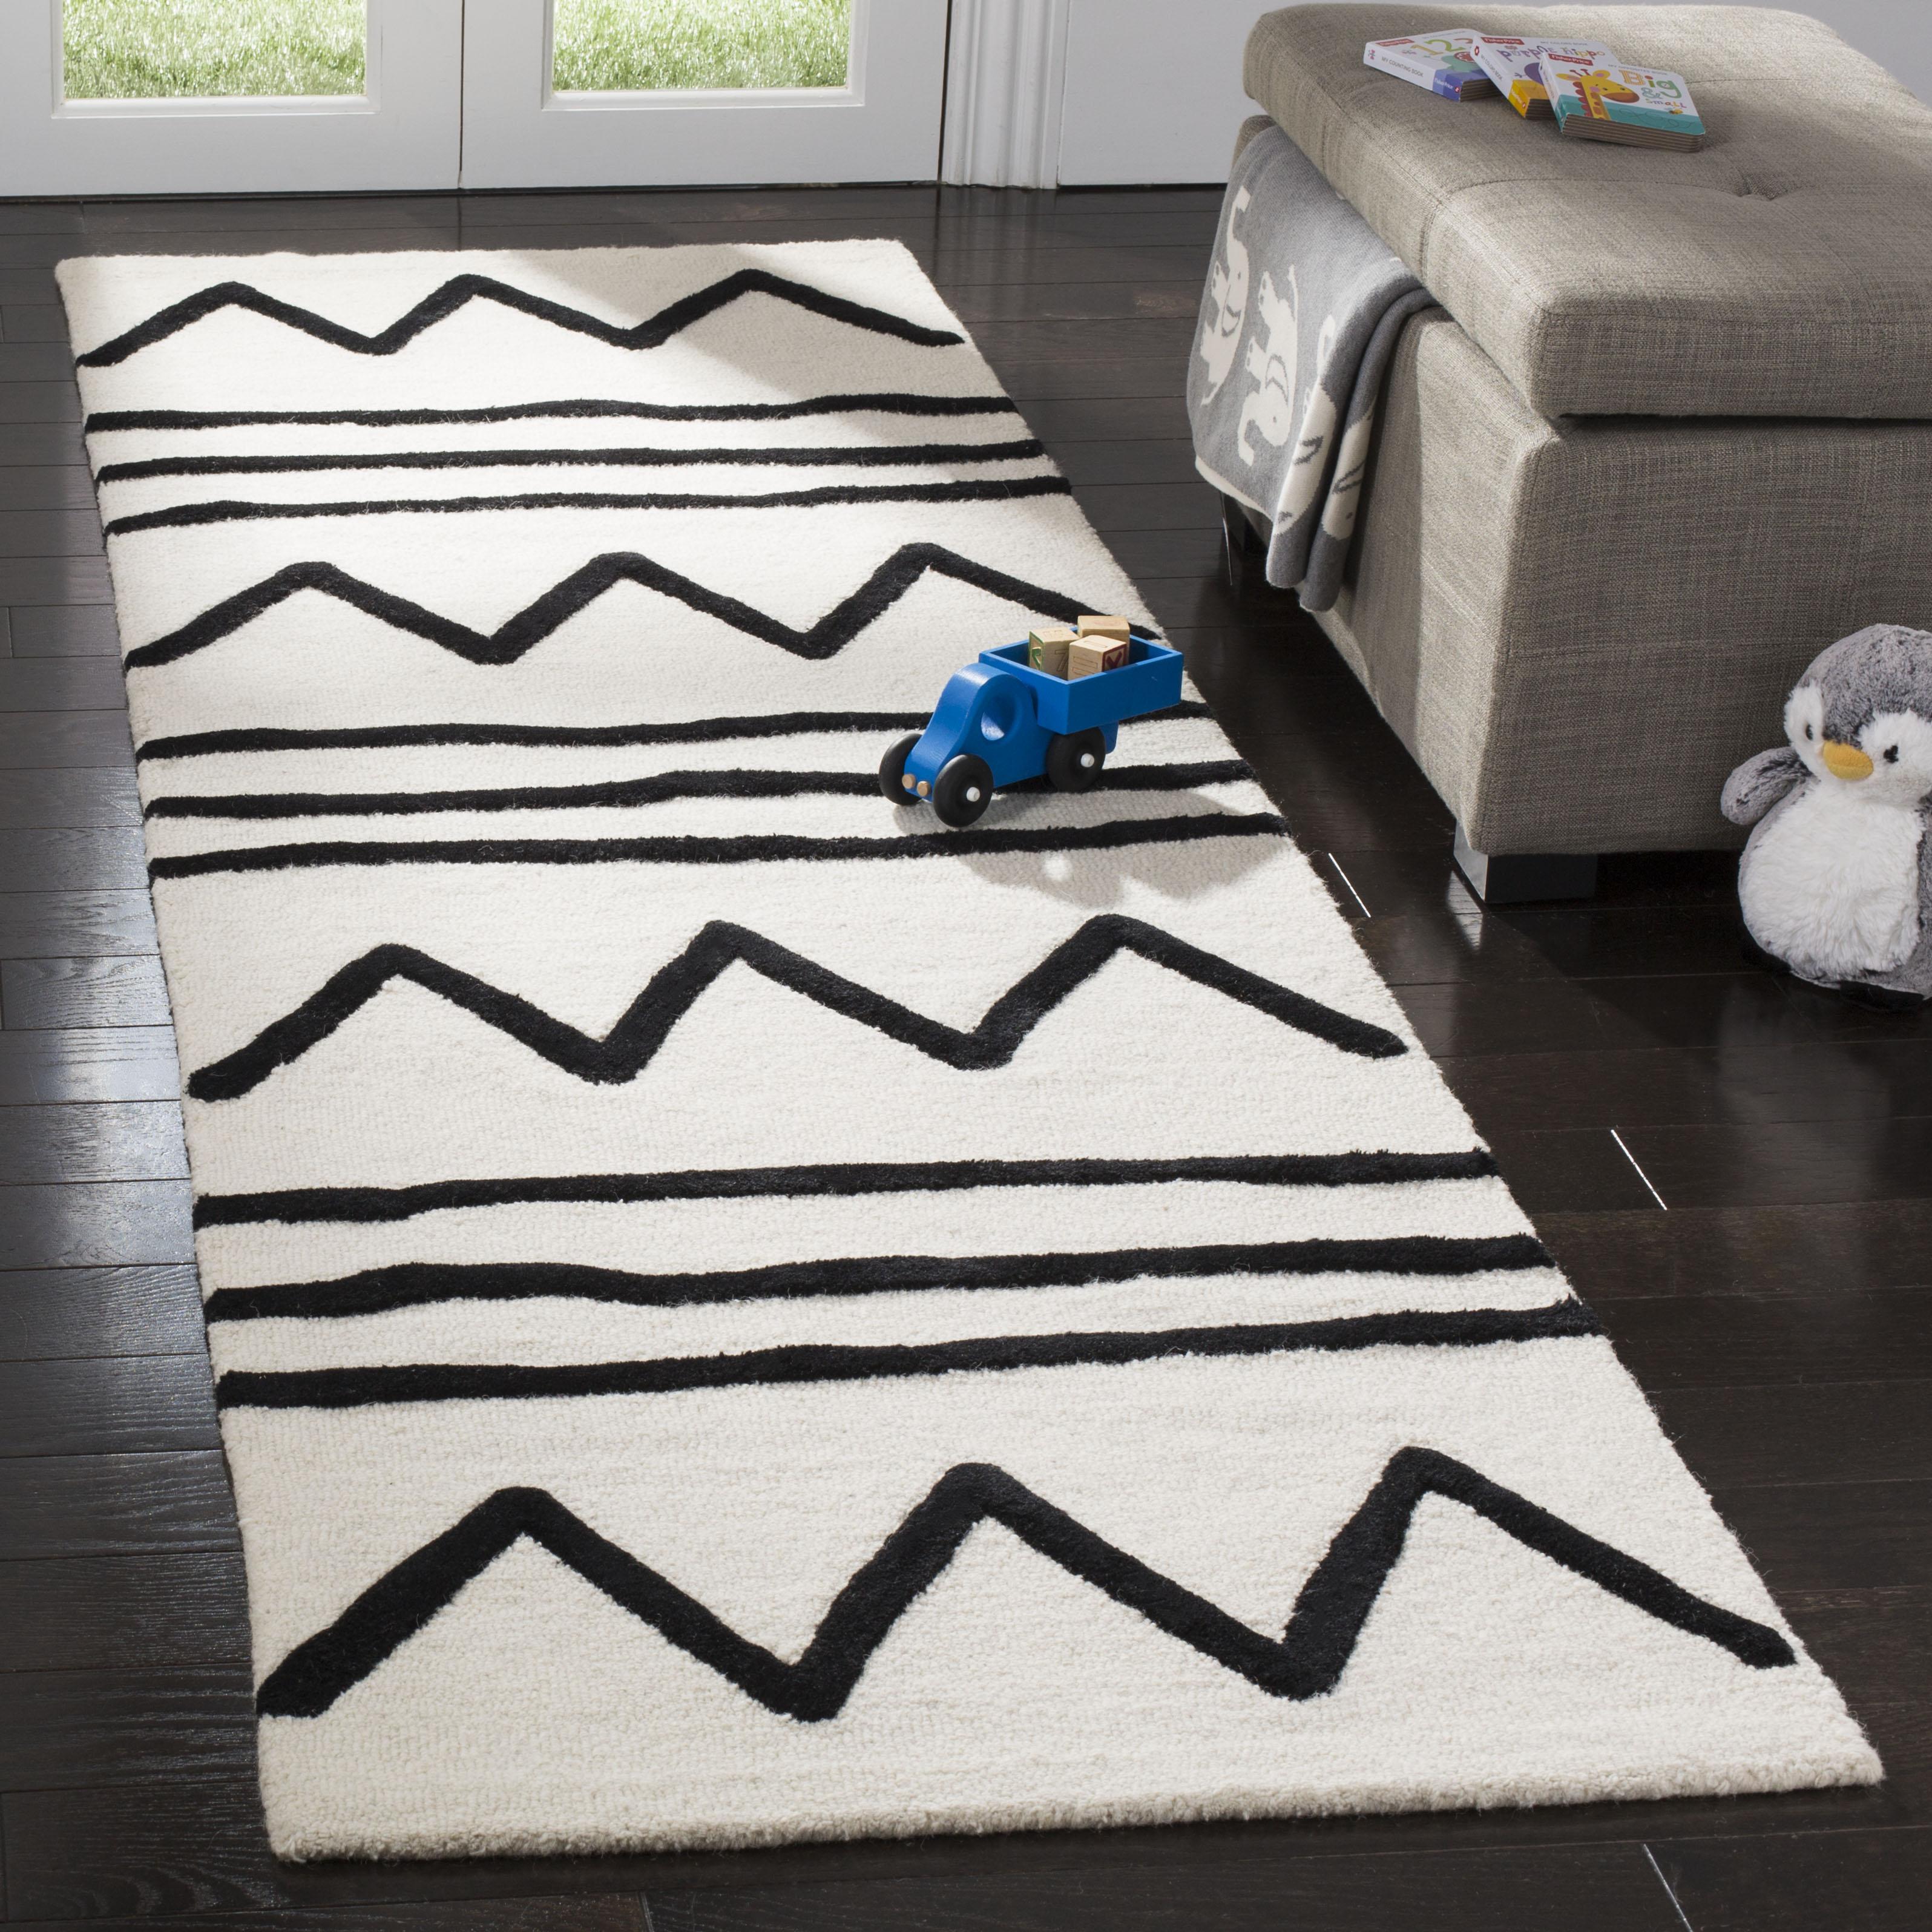 Safavieh Kids Zigzag Stripes Area Rug or Runner